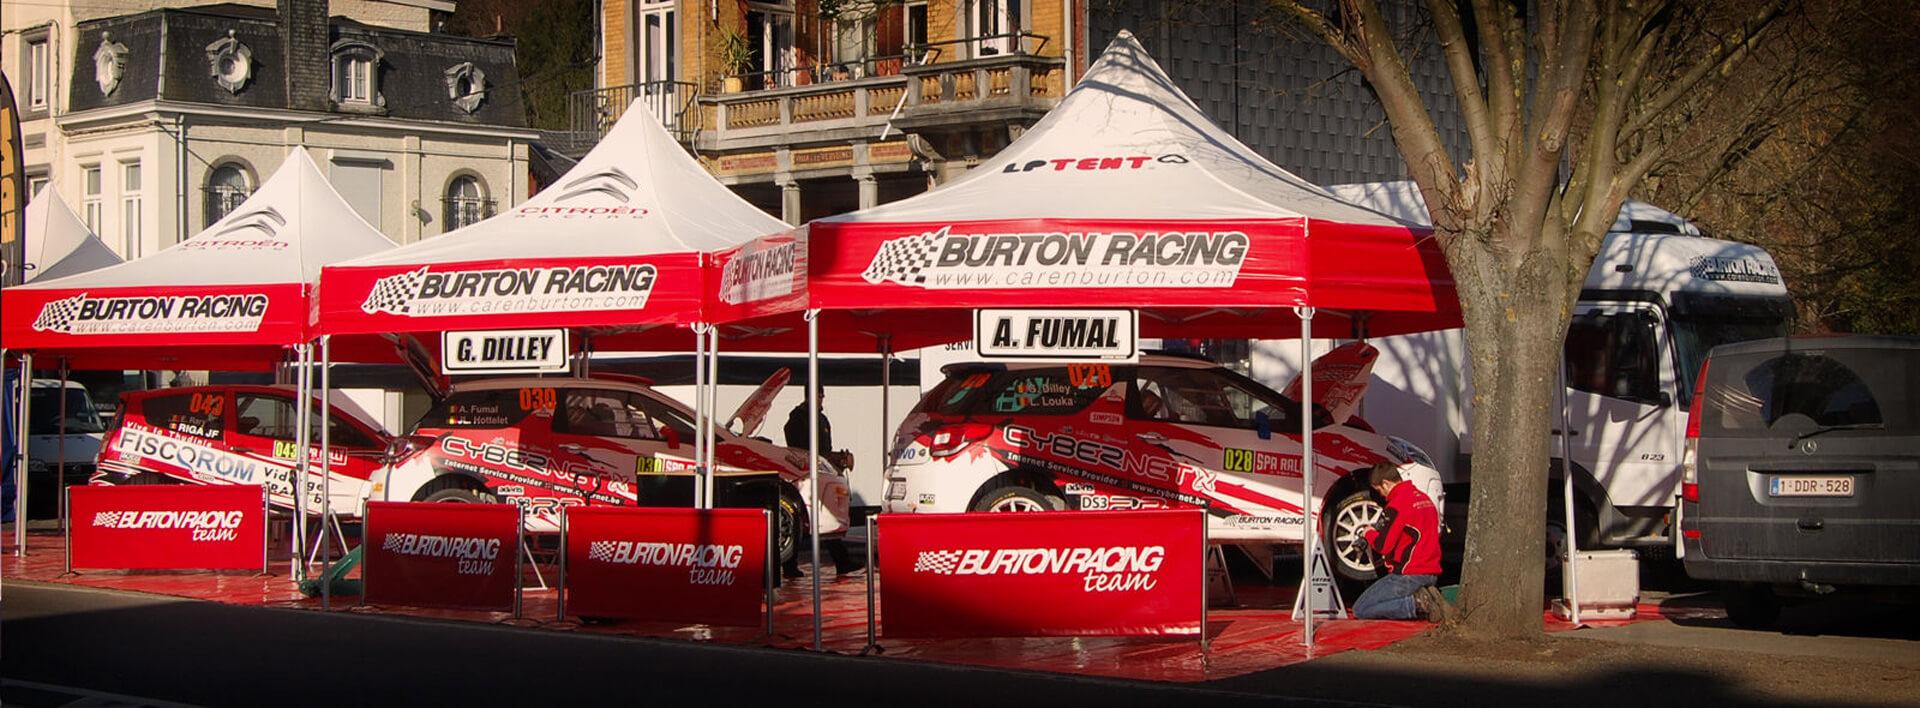 Tente paddock rallye